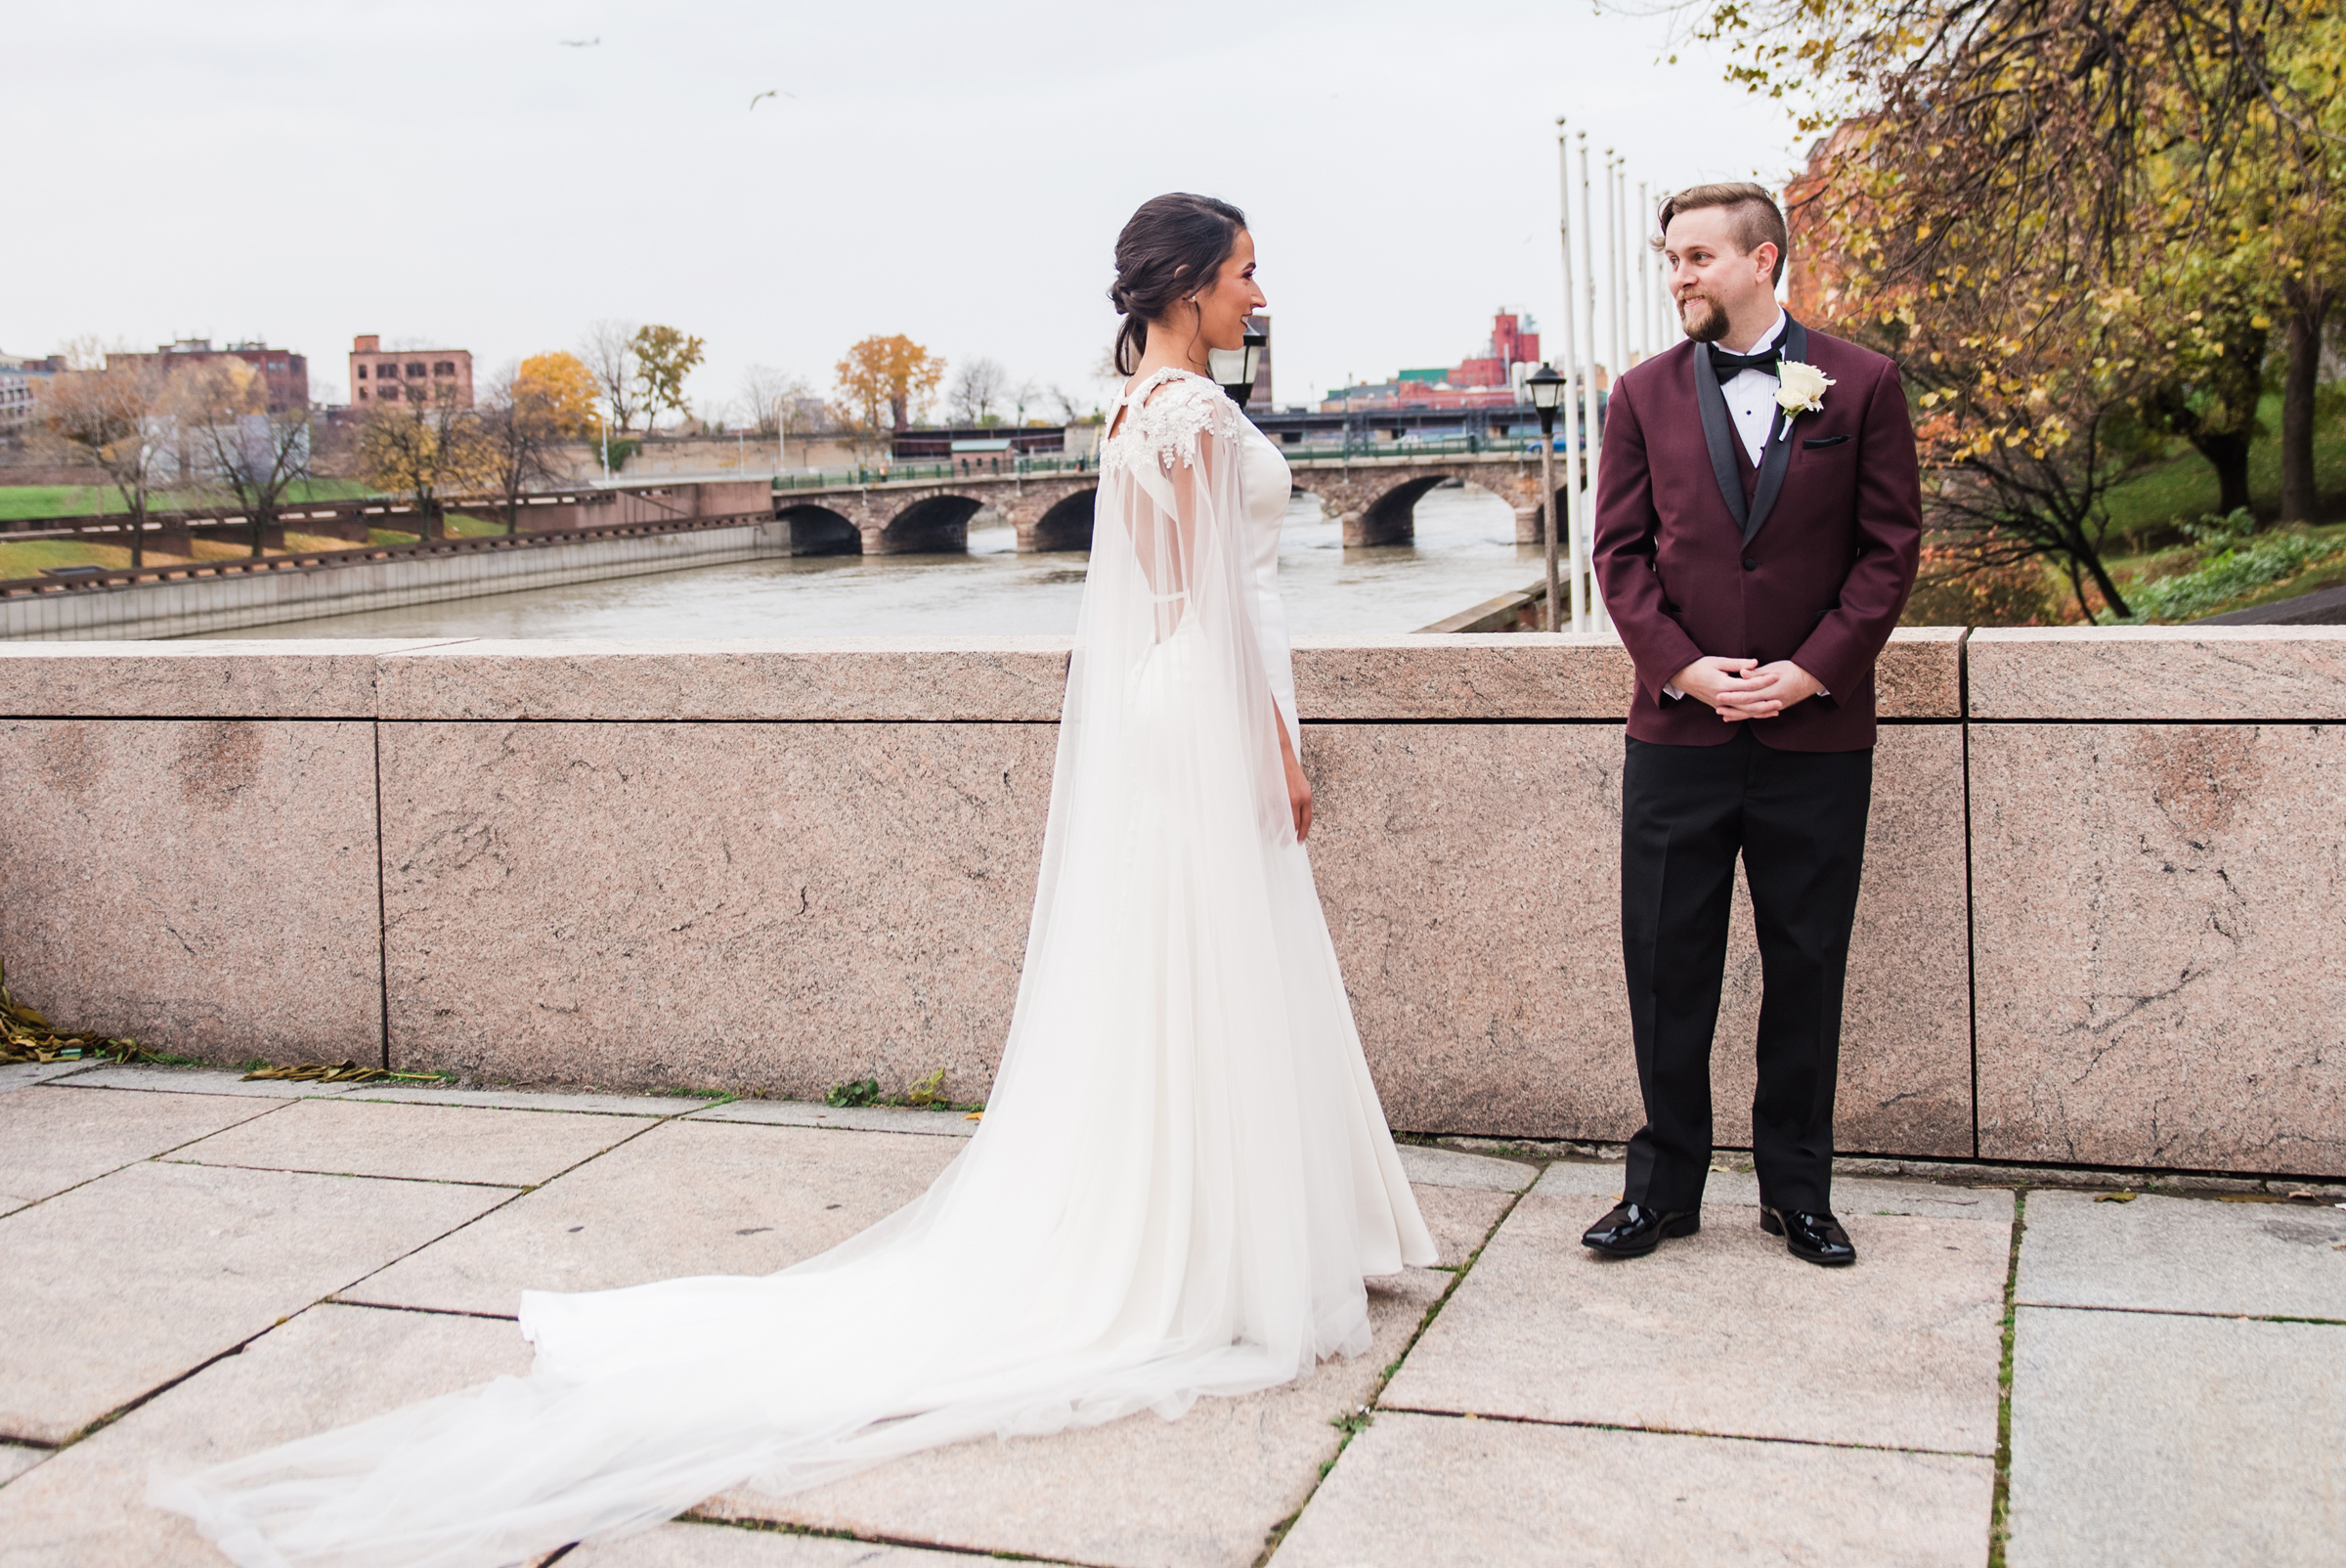 Wintergarden_by_Monroes_Rochester_Wedding_JILL_STUDIO_Rochester_NY_Photographer_163333.jpg